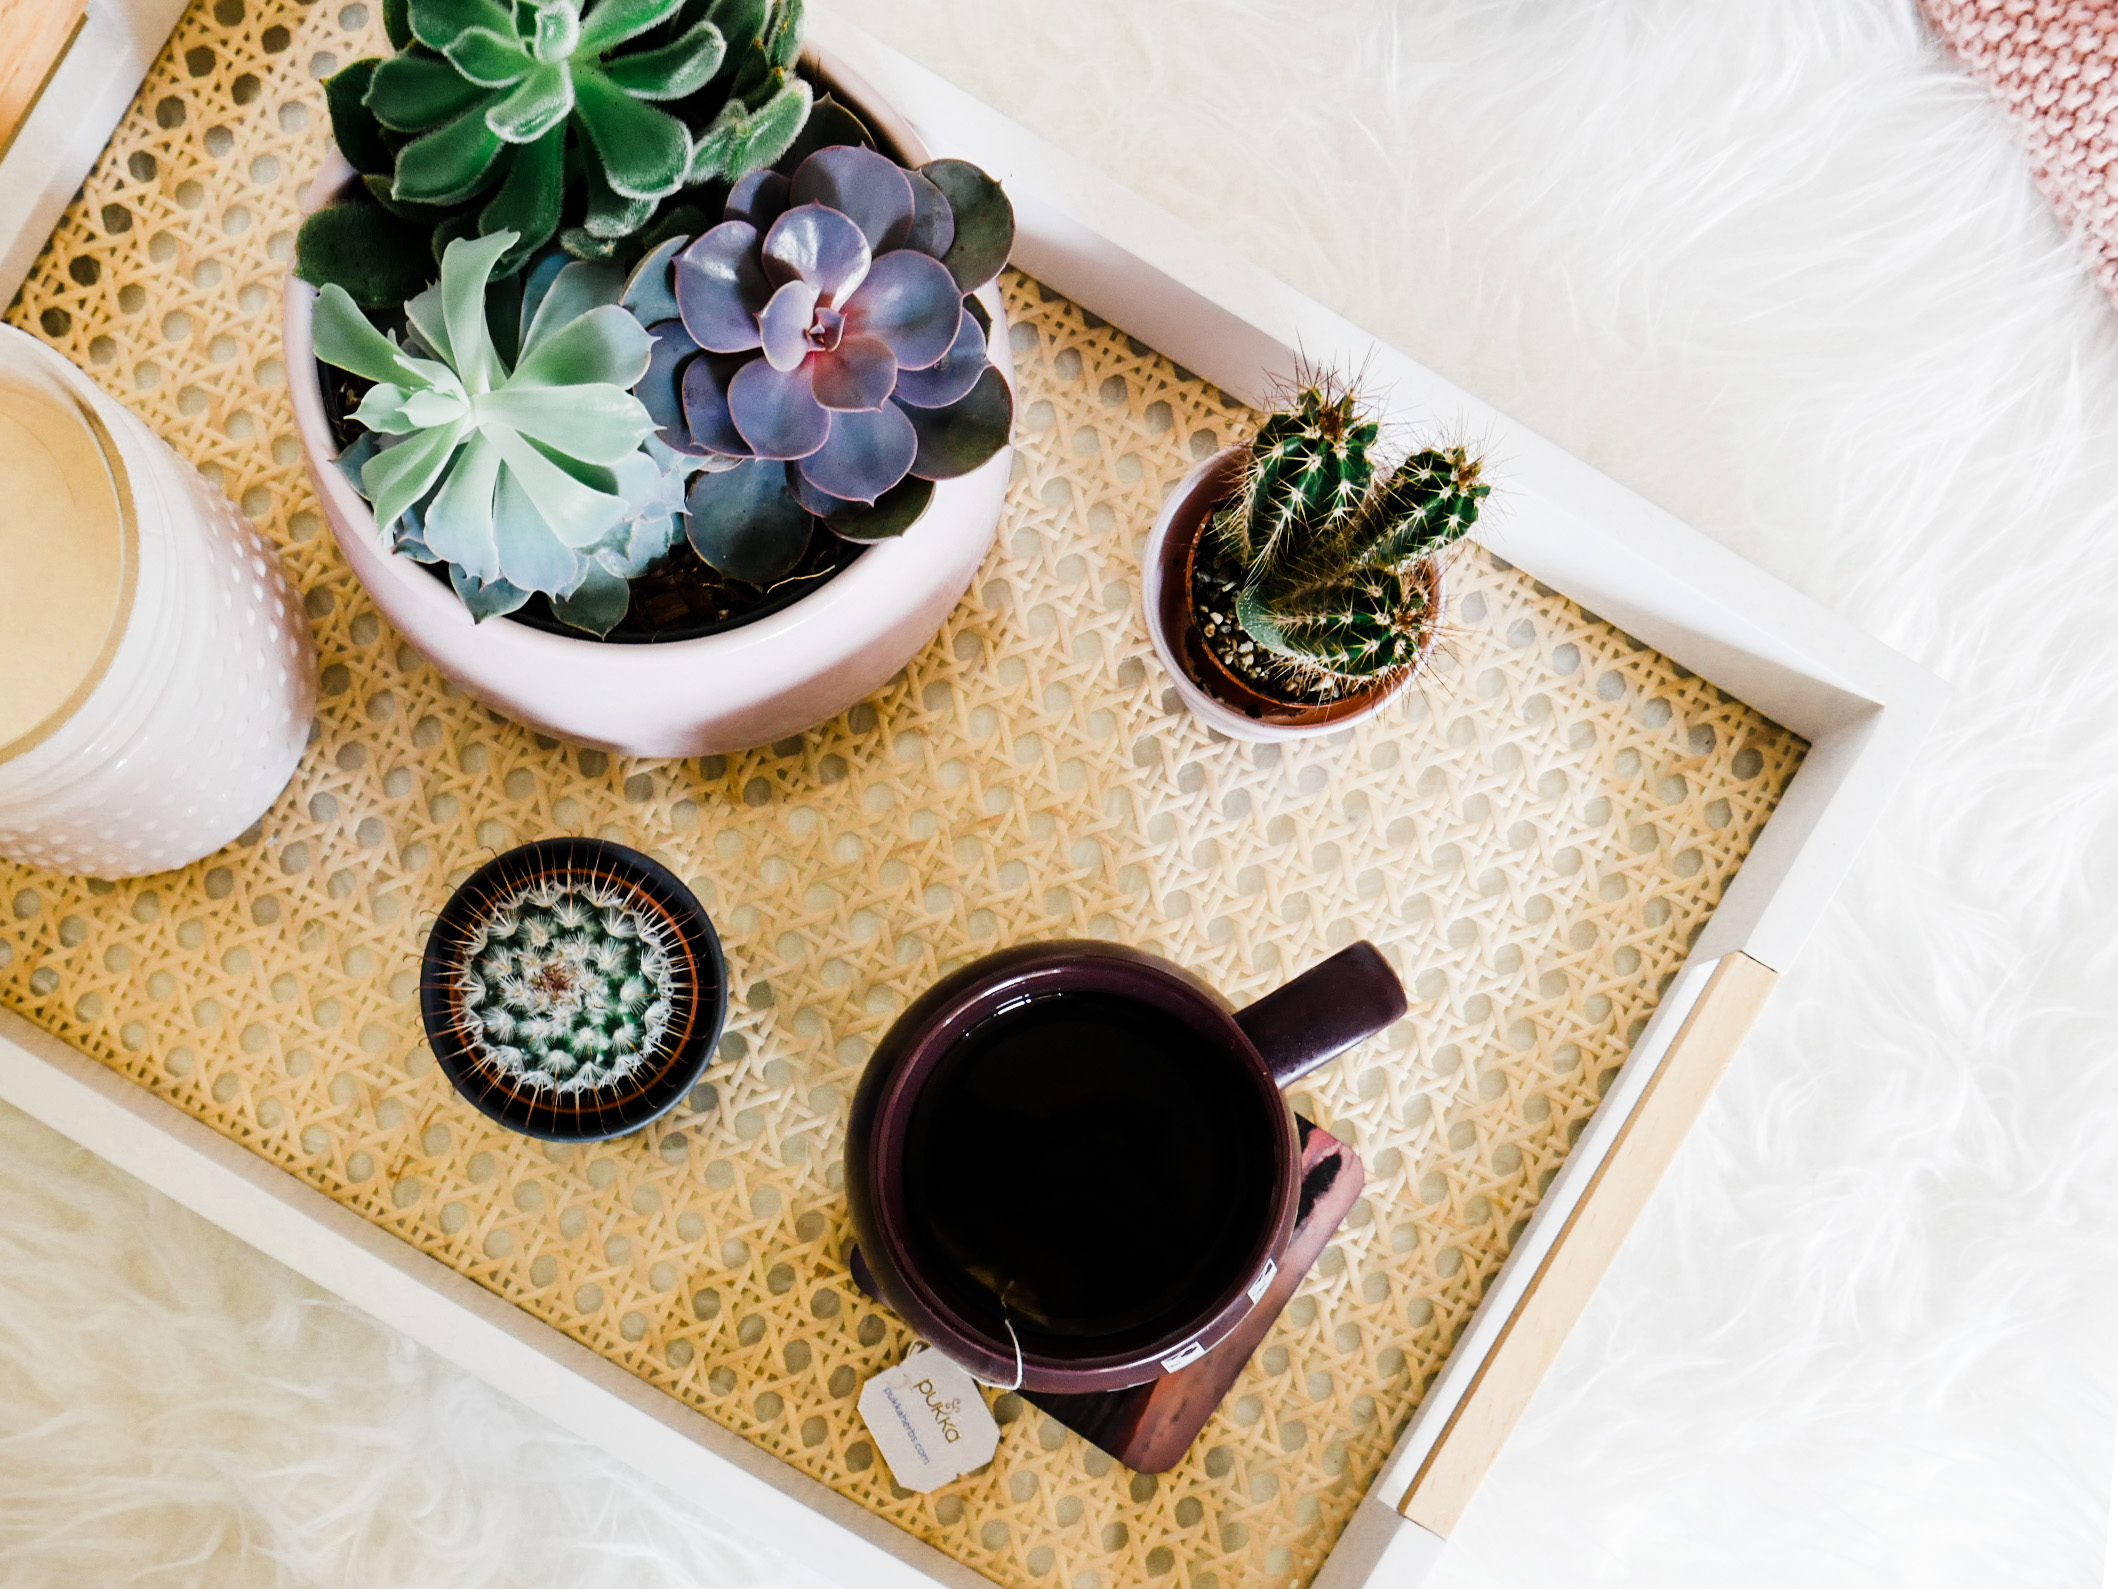 5 Ways to Practice Self Care